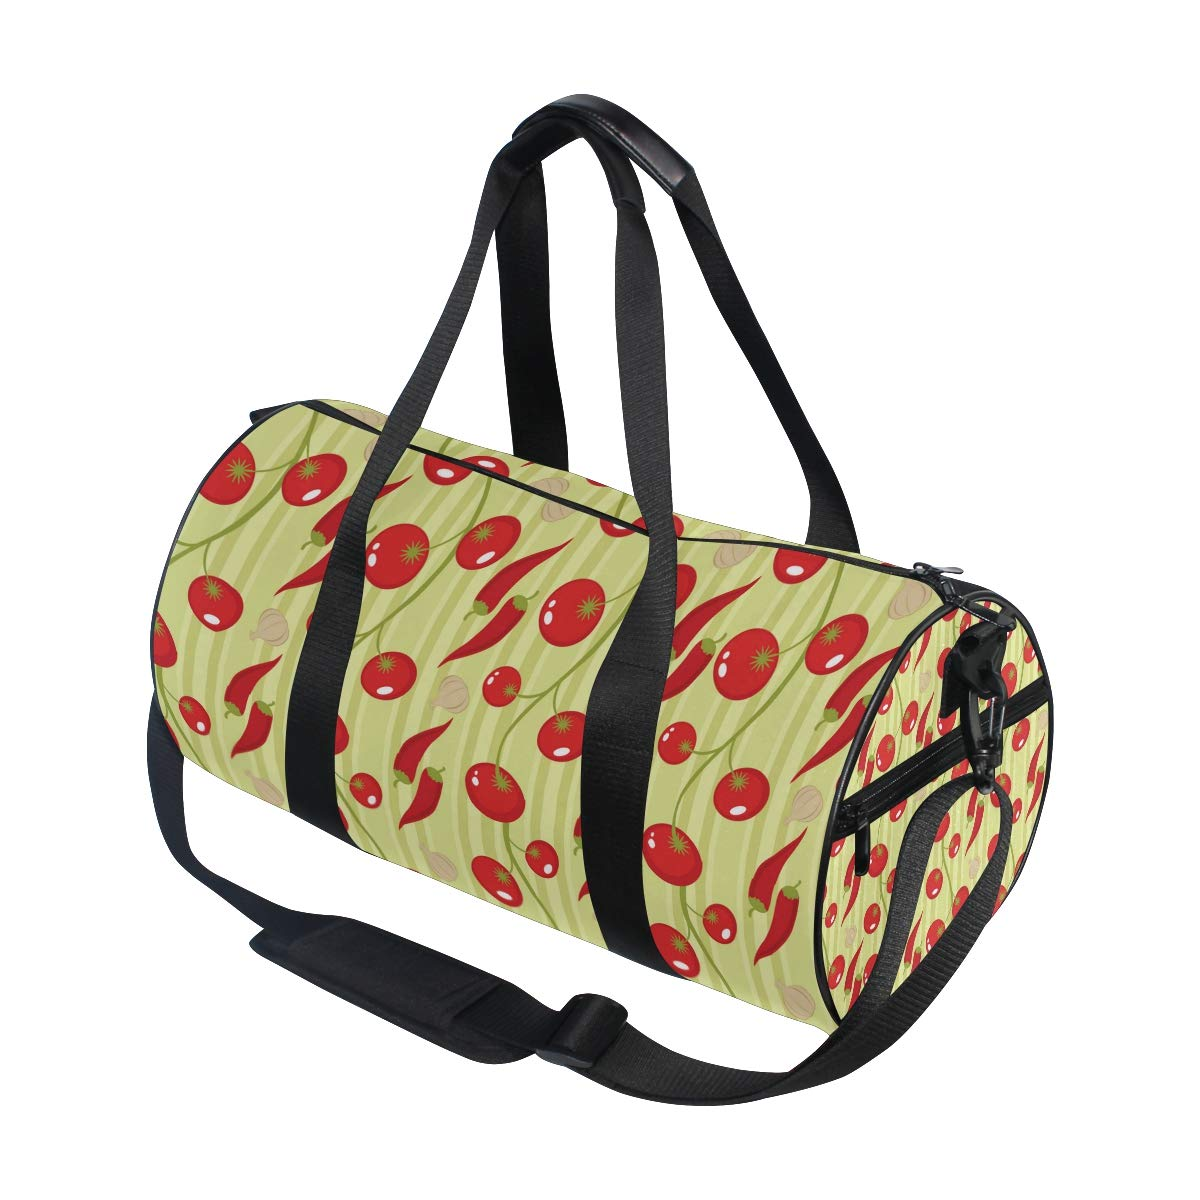 Waterproof Non-Slip Wearable Crossbody Bag fitness bag Shoulder Bag Dry Vegetable